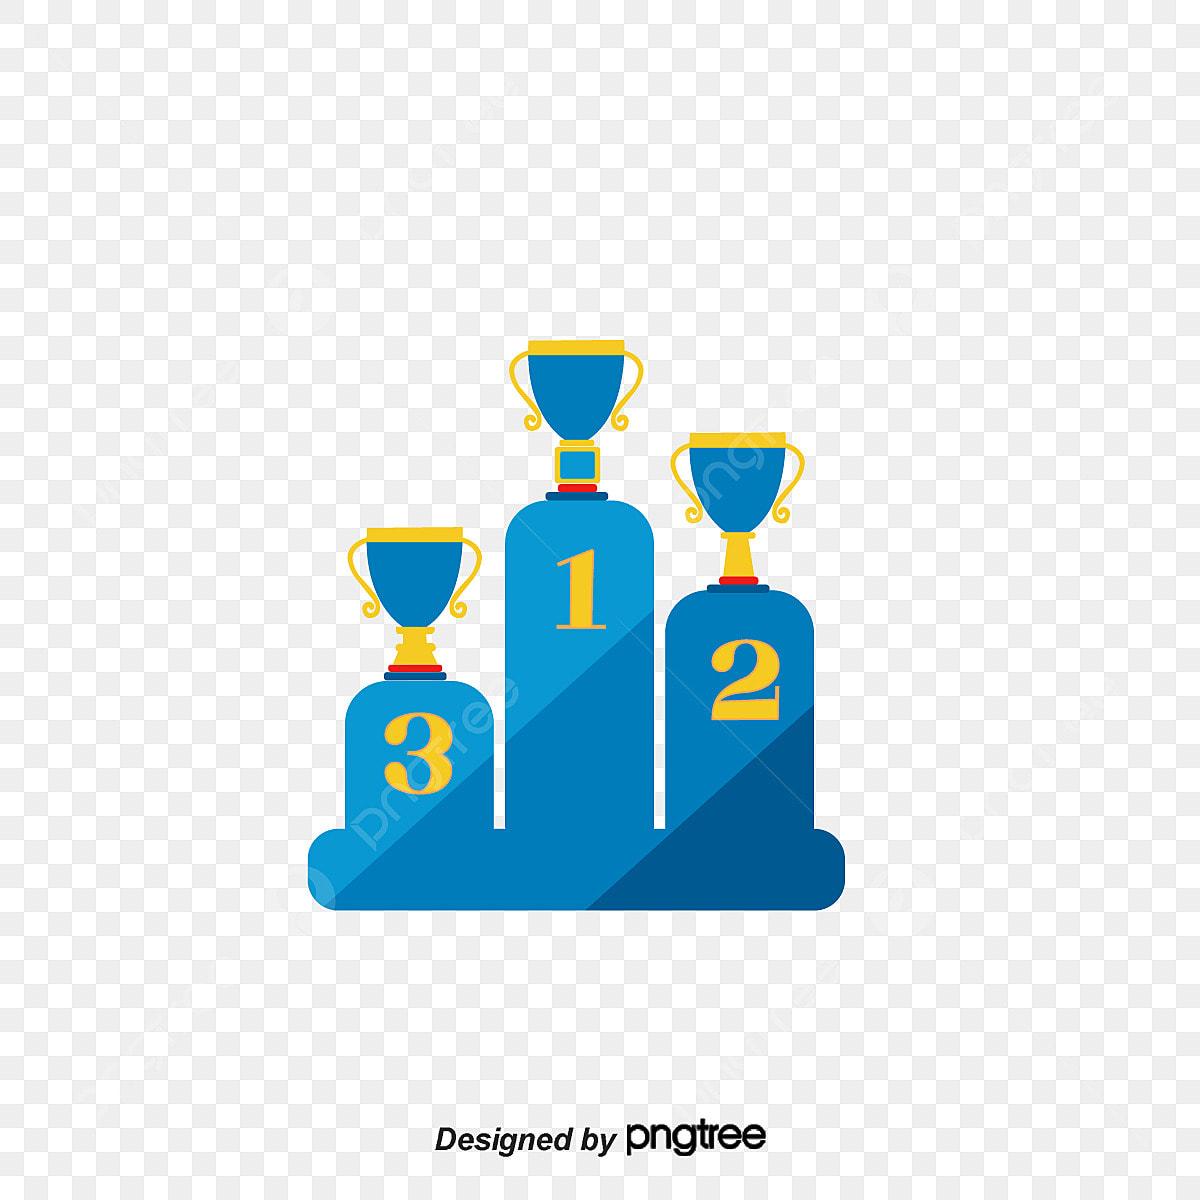 Transparent Irish Png - Ireland Hat Png, Png Download , Transparent Png  Image - PNGitem